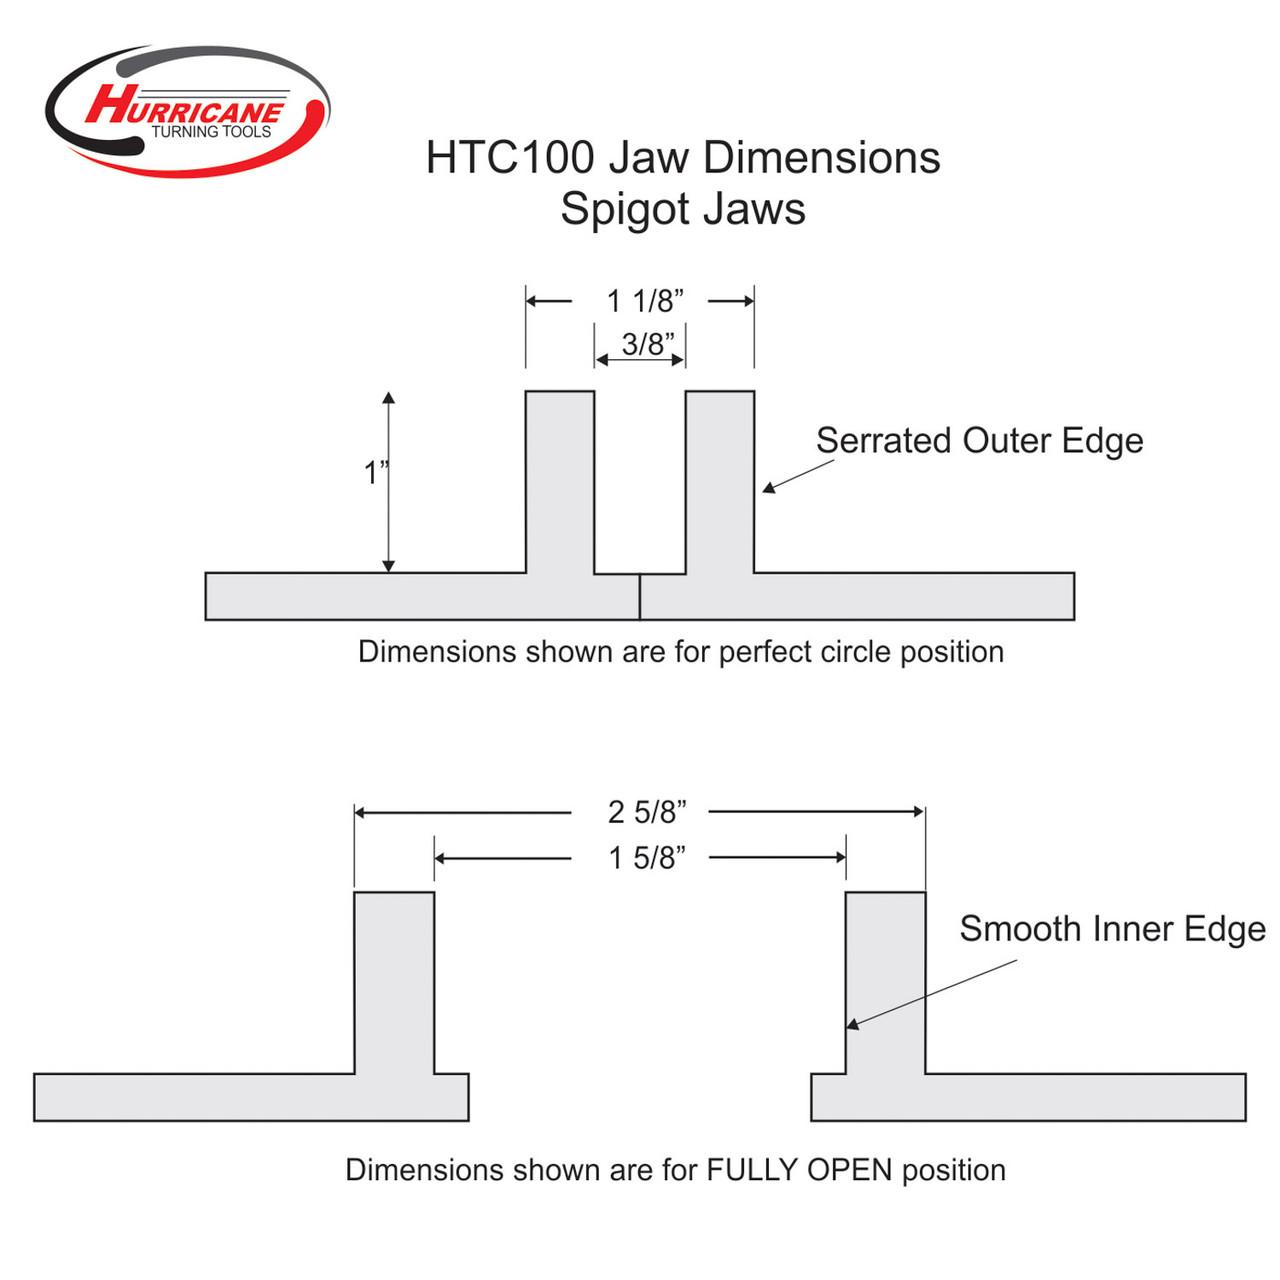 Hurricane Spigot Jaws for the HTC100 Chuck